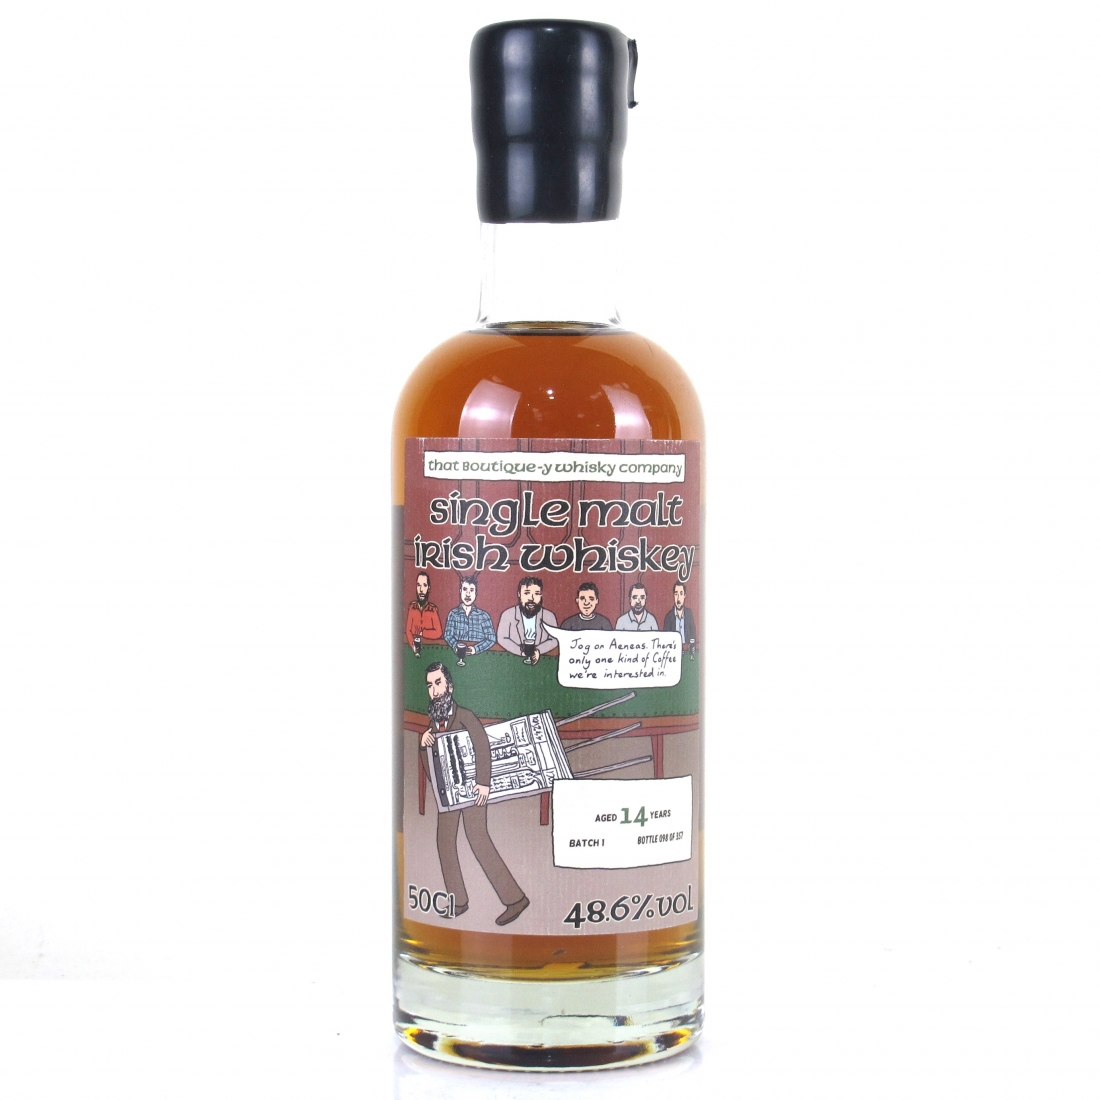 Irish Single Malt No.2 That Boutique-y Whisky Company 14 Year Old Batch #1